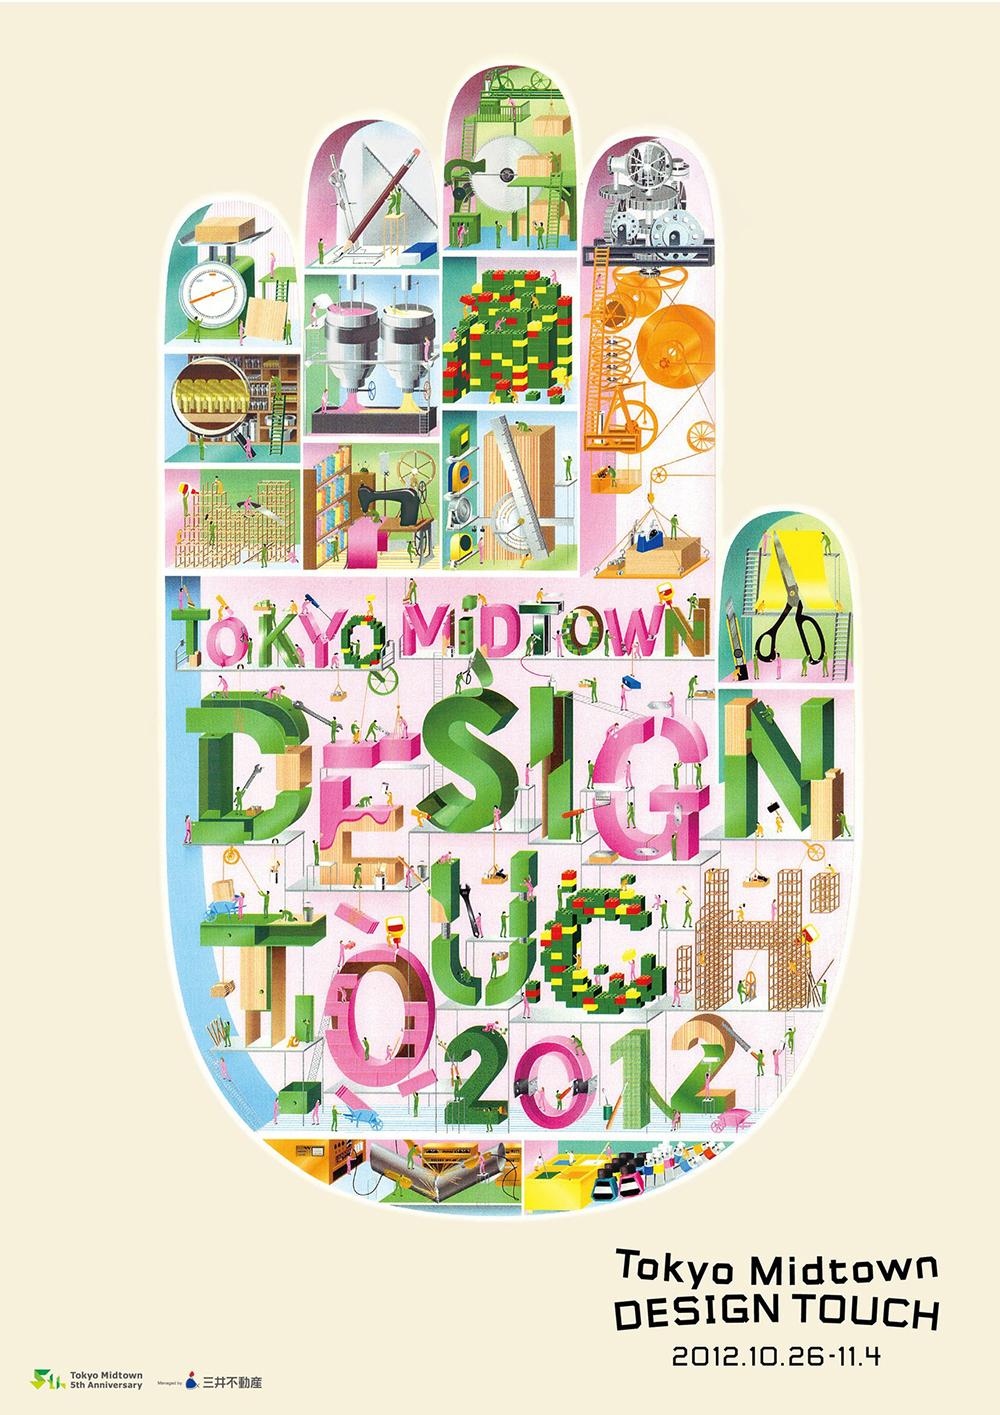 Tokyo Midtown Design Touch. Tatsuki Ikezawa. 2012.